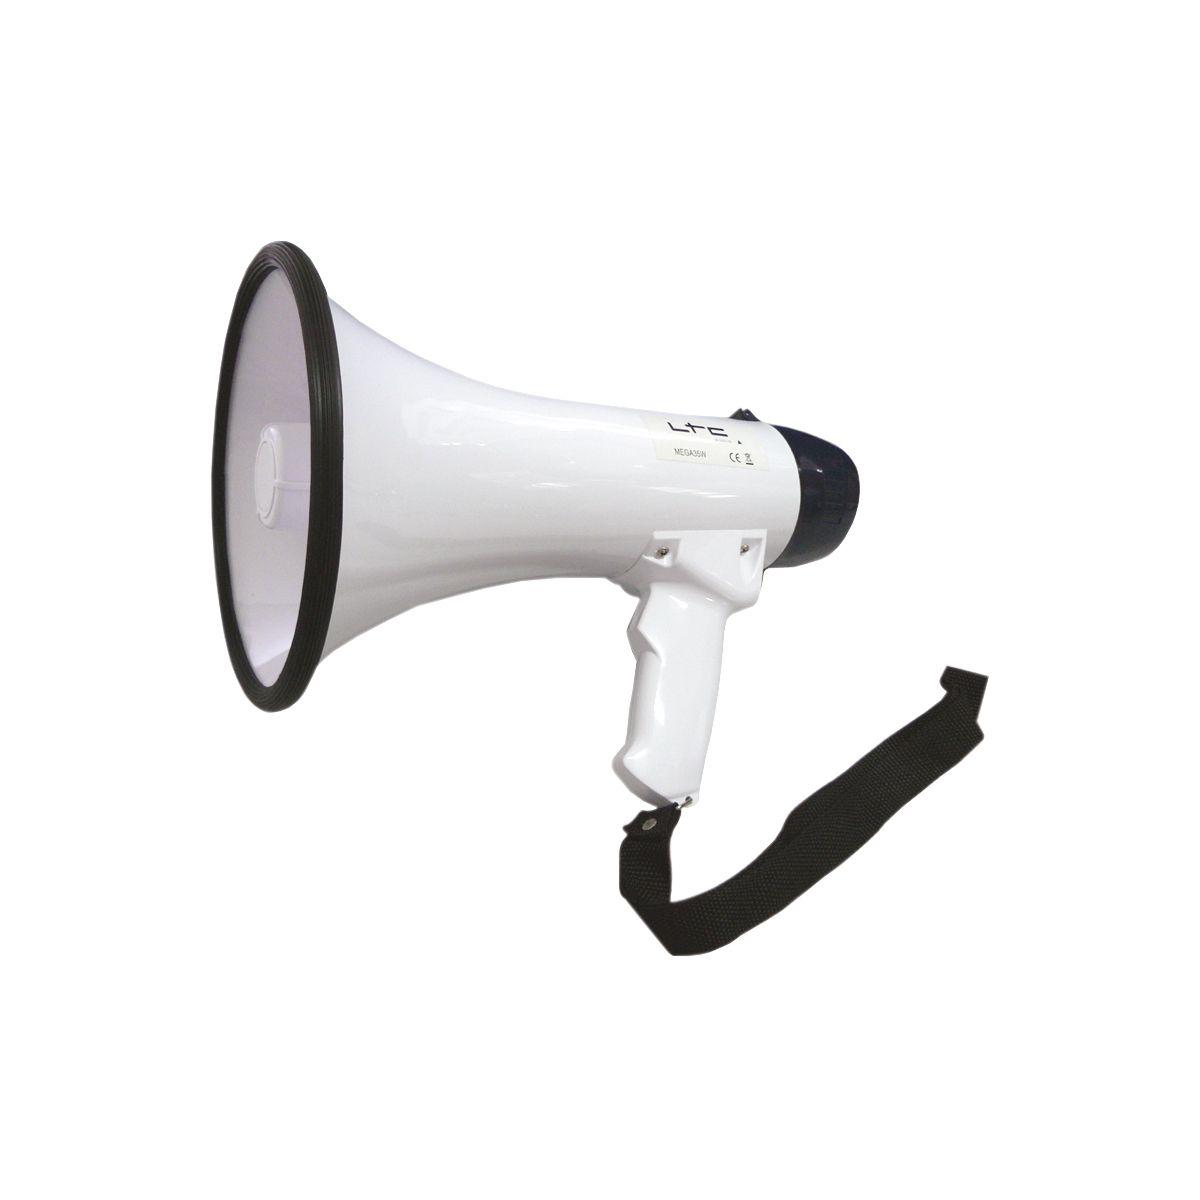 Microphone LTC AUDIO MEGA35W (photo)